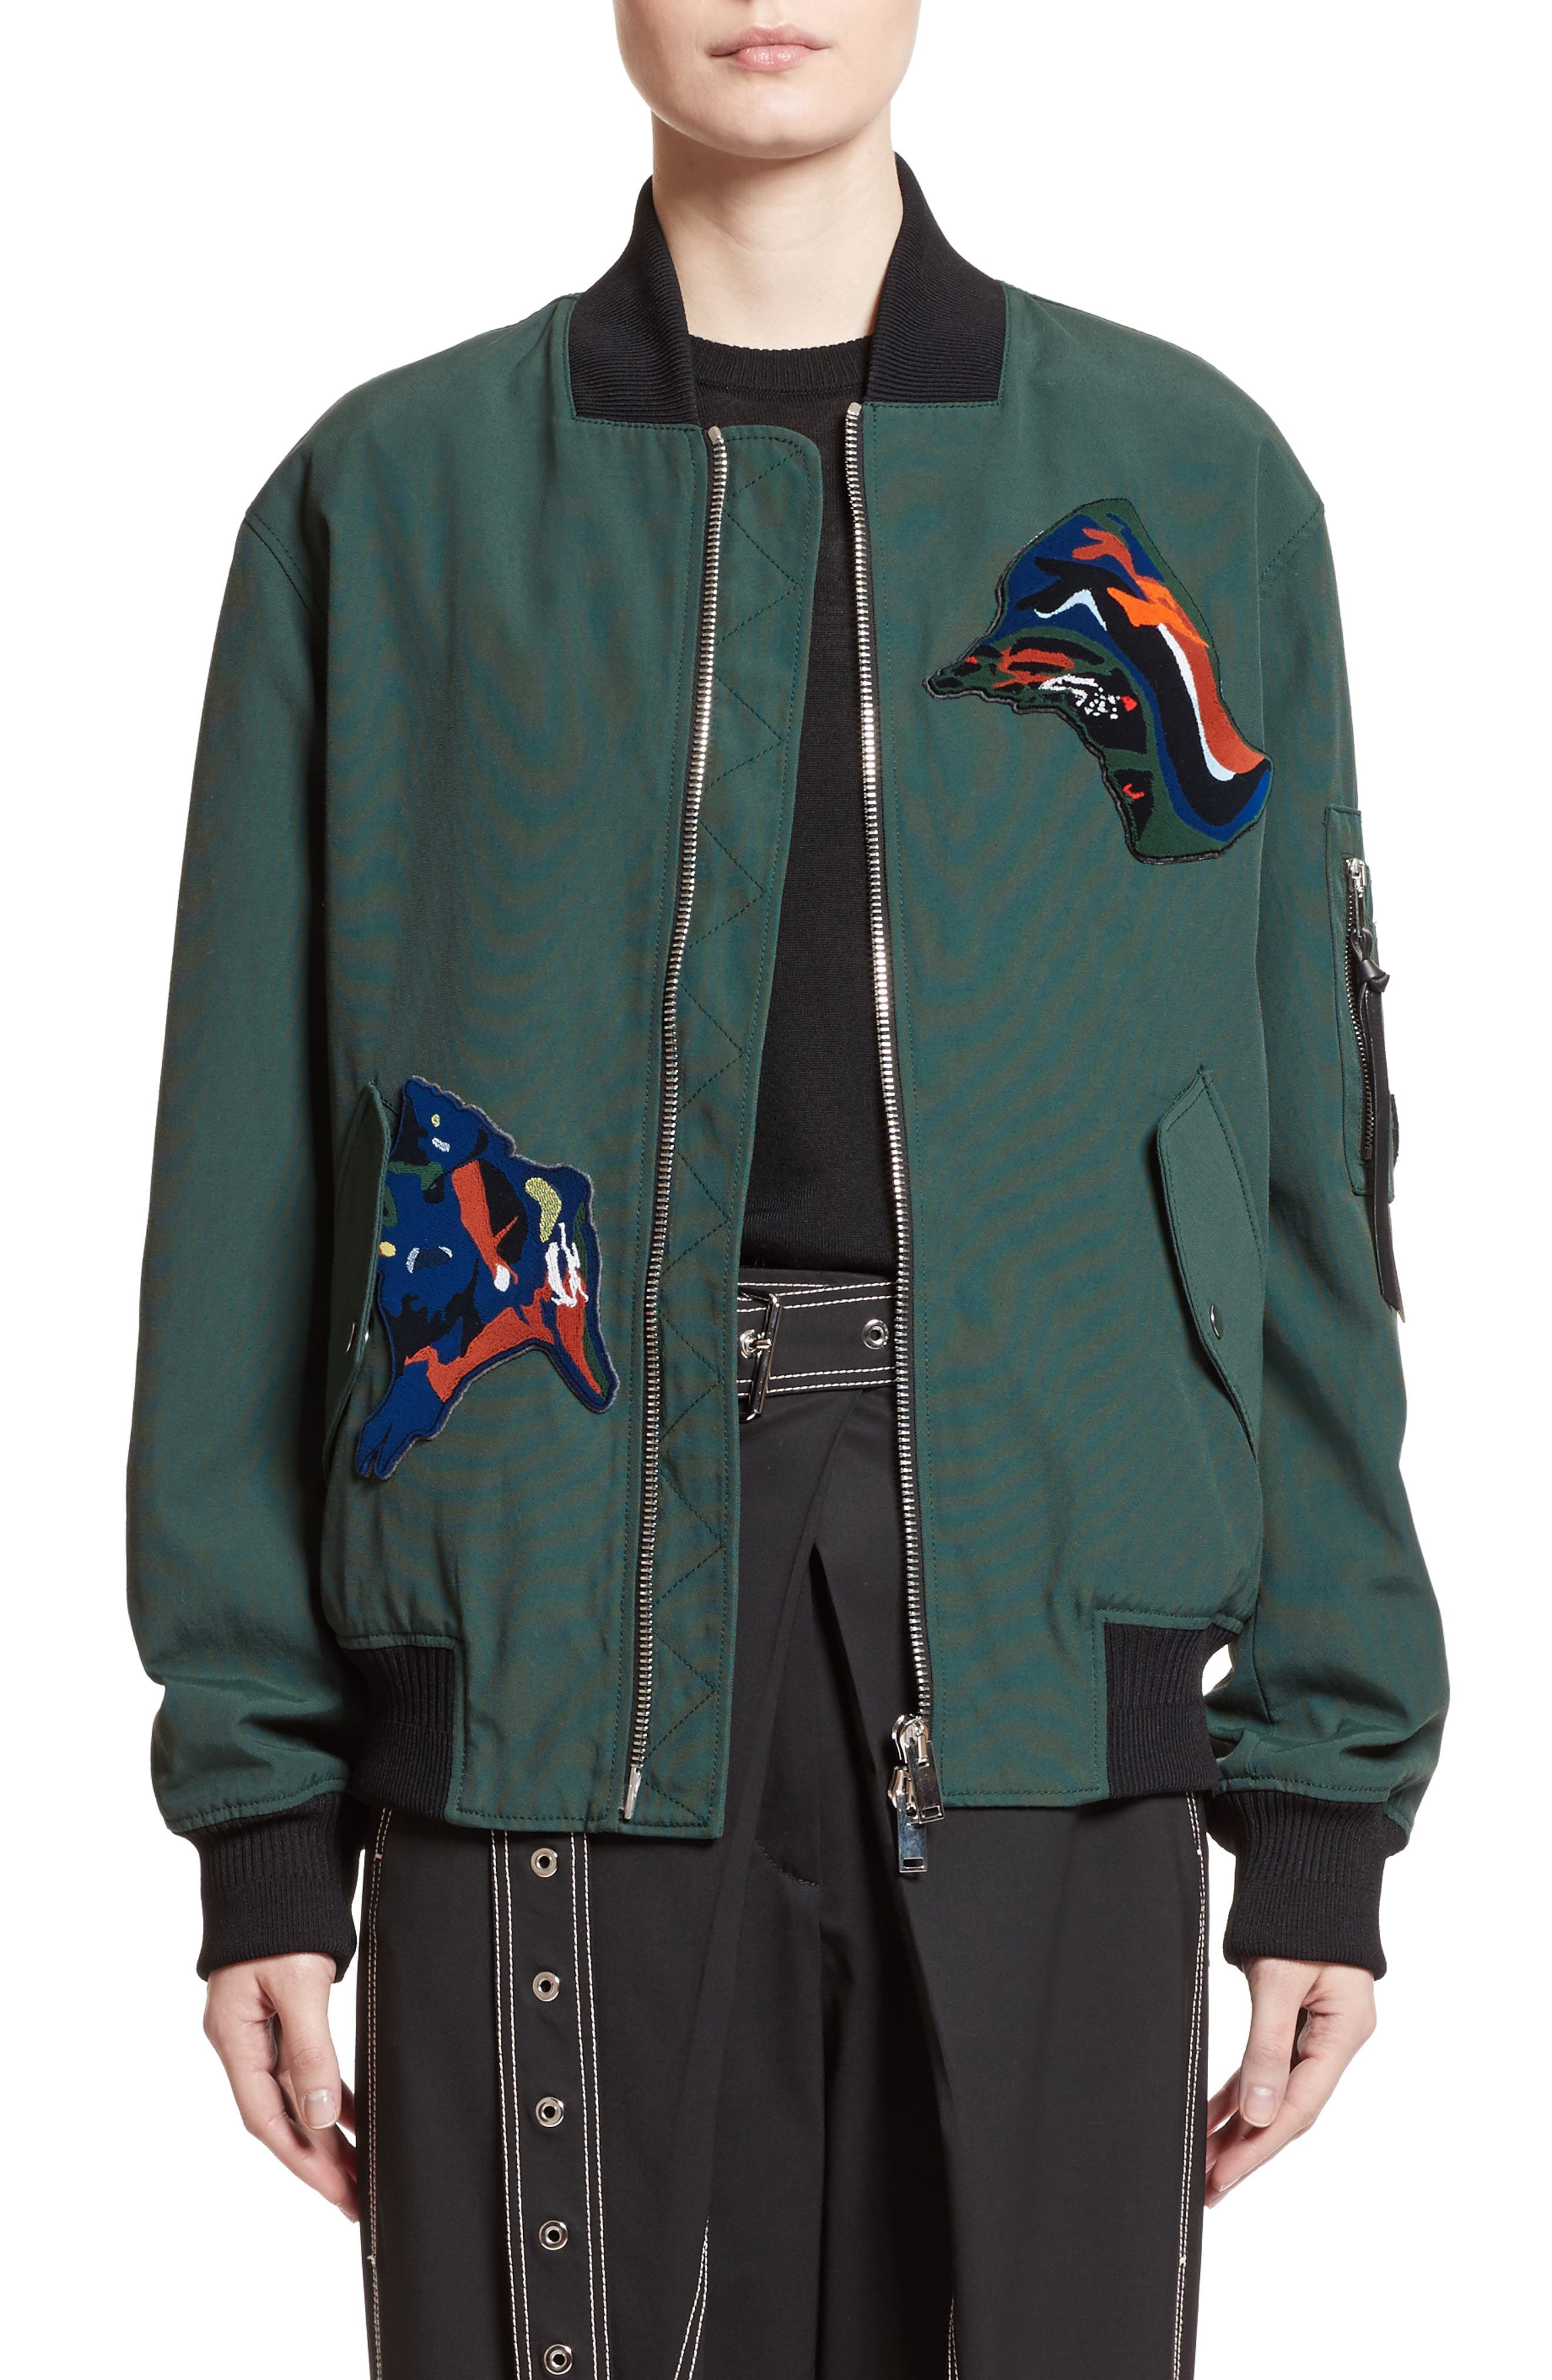 Patch Embellished Bomber Jacket,                             Main thumbnail 1, color,                             331